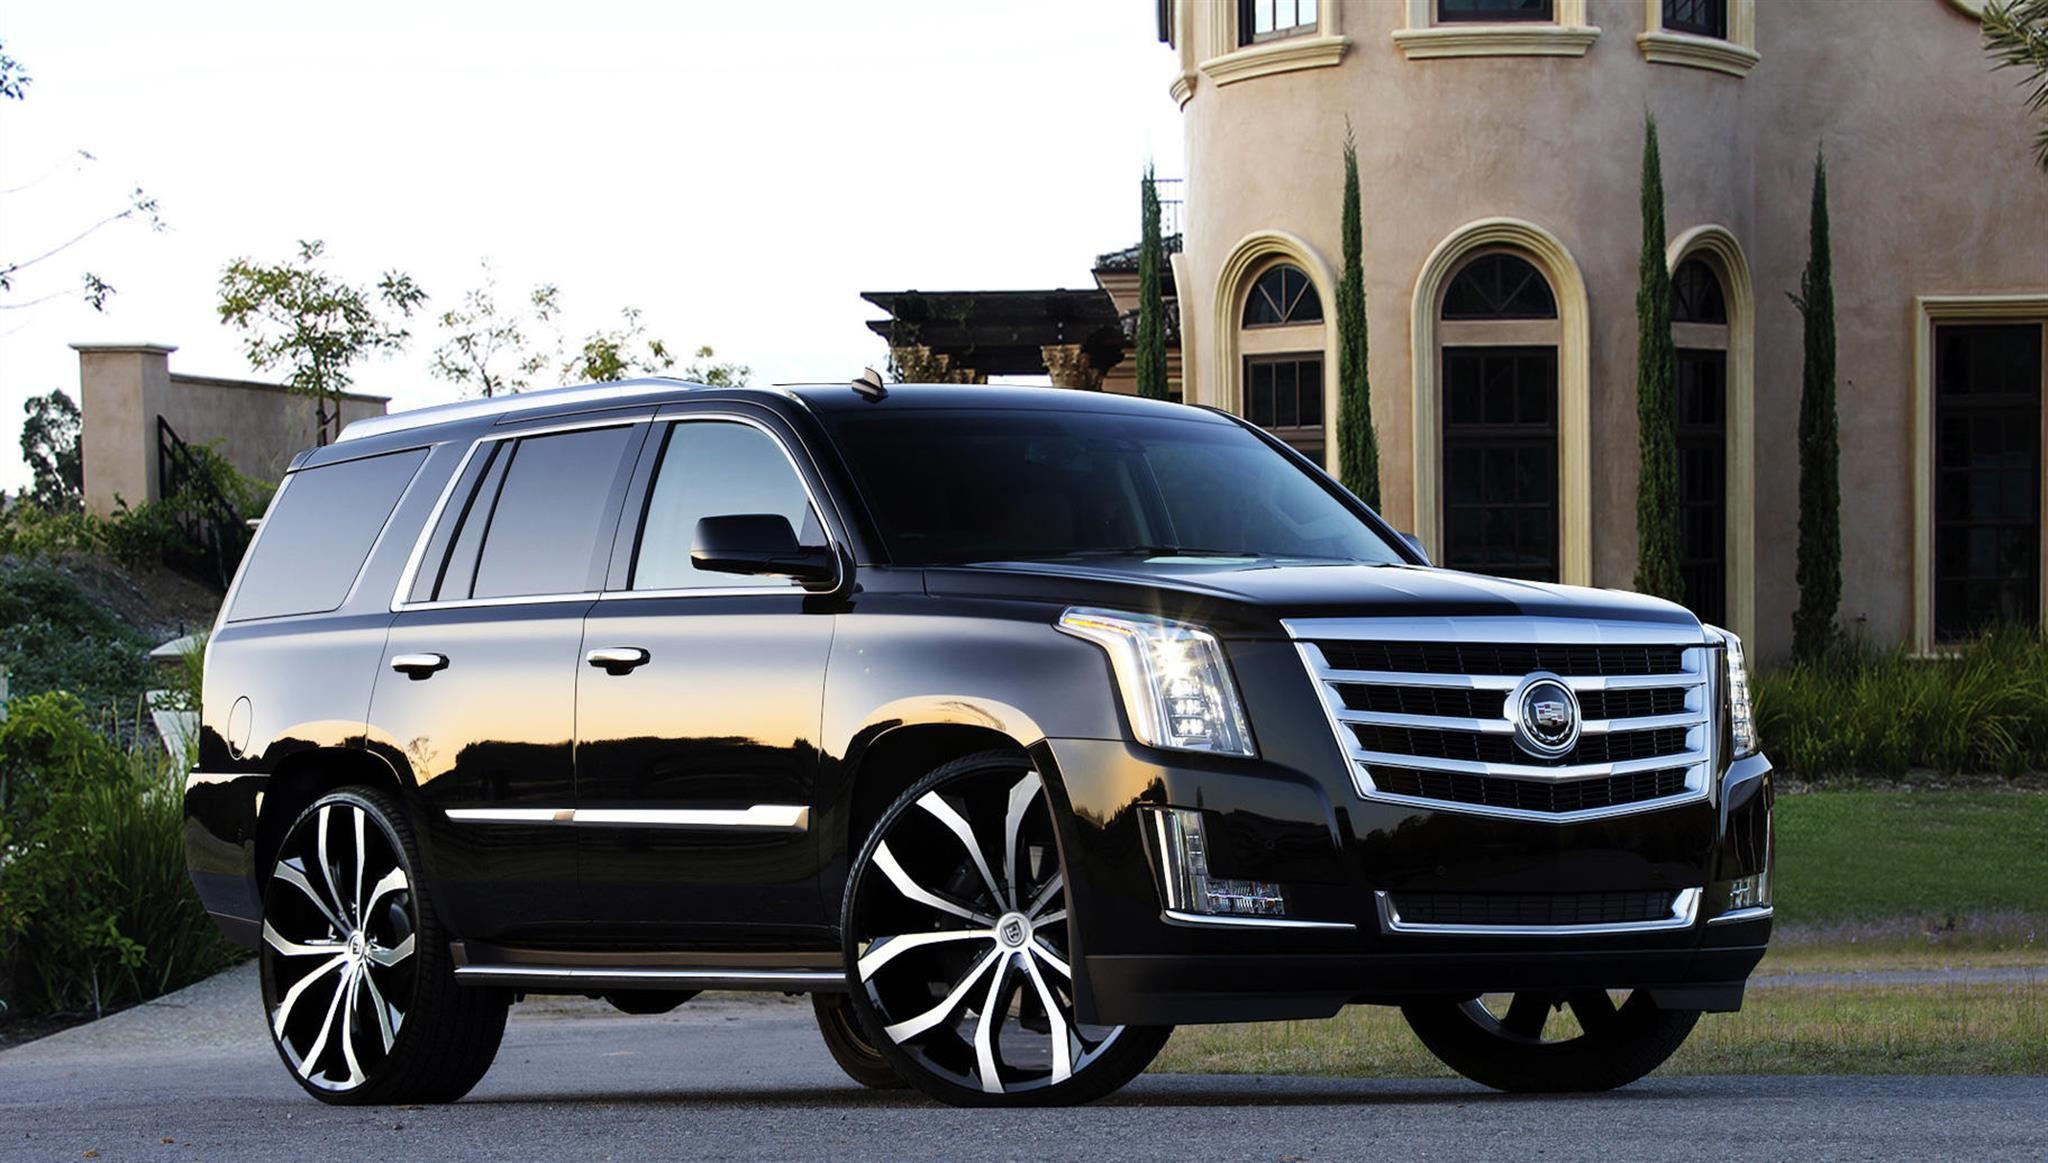 Pin On Custom Cadillac Cars